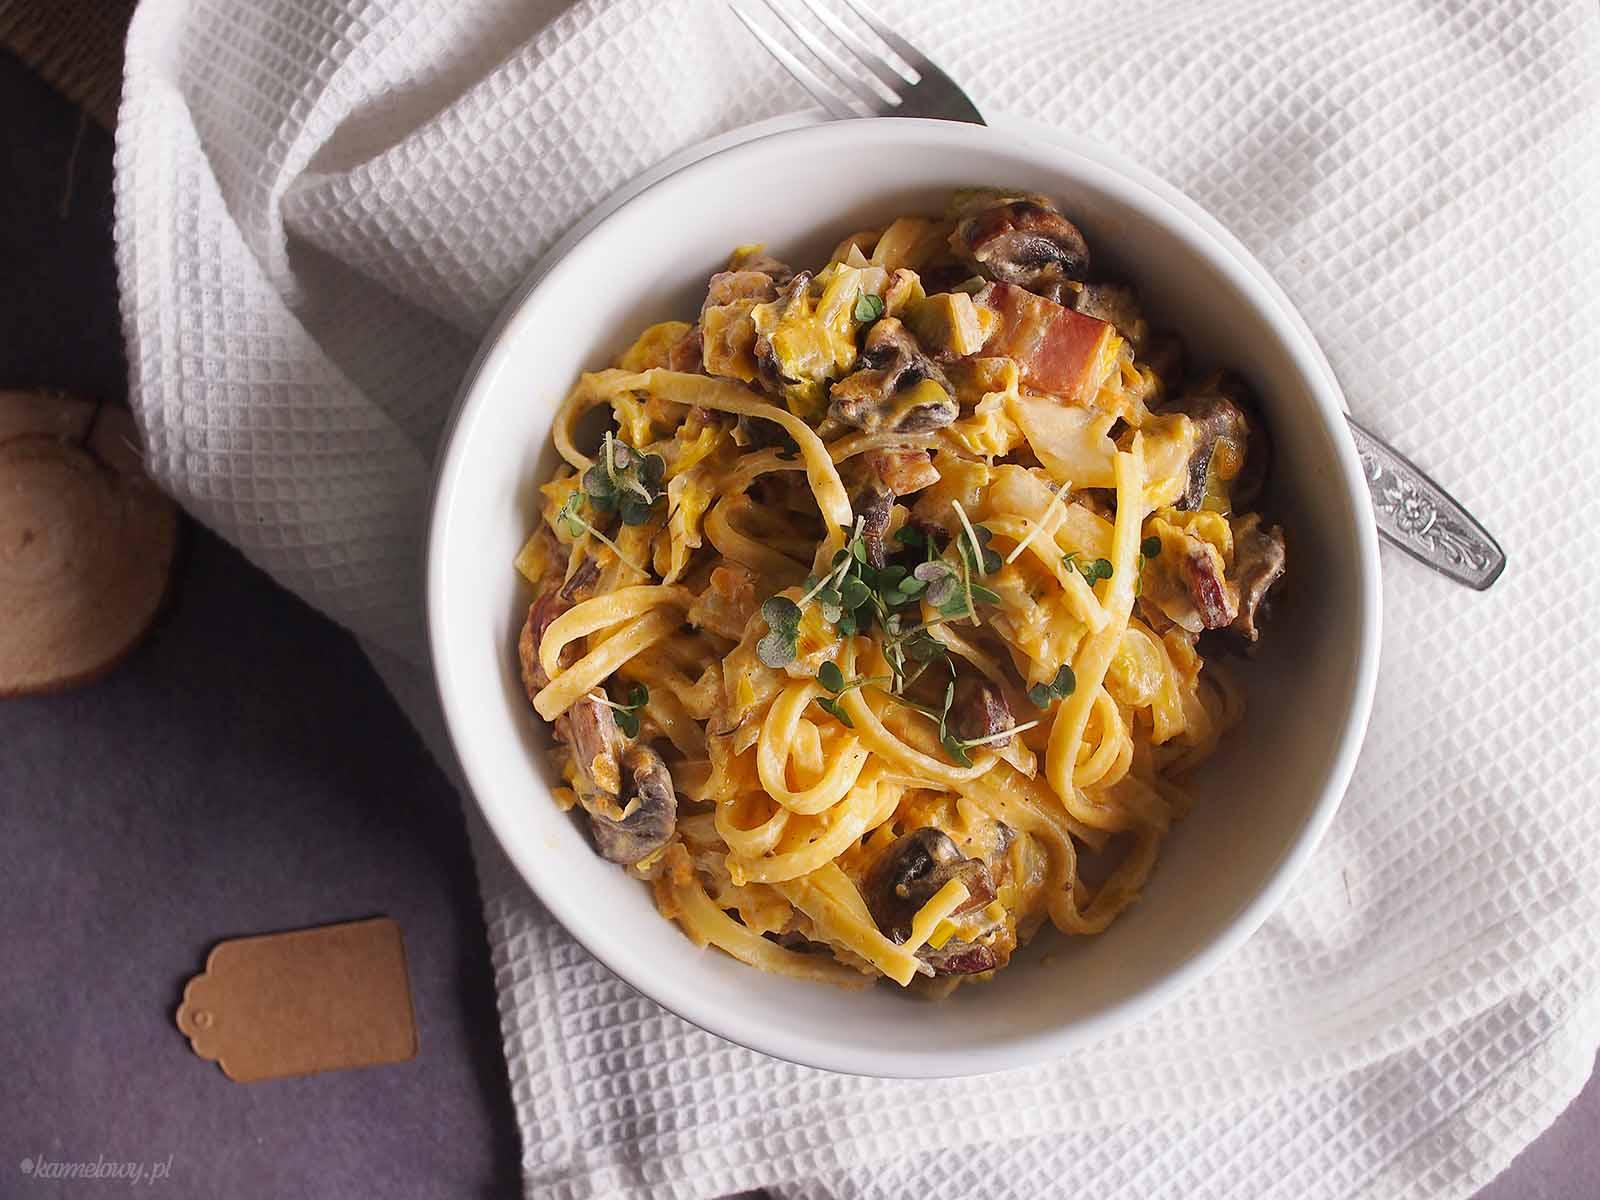 Makaron-z-kielbasa-i-mloda-kapusta-Sausage-and-young-cabbage-pasta